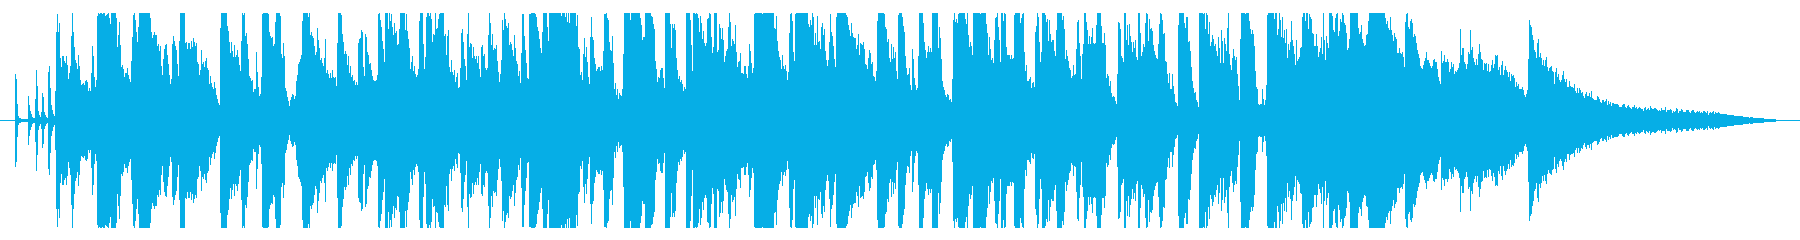 CM30秒ウイスキーのCMなどに最適ですの再生済みの波形